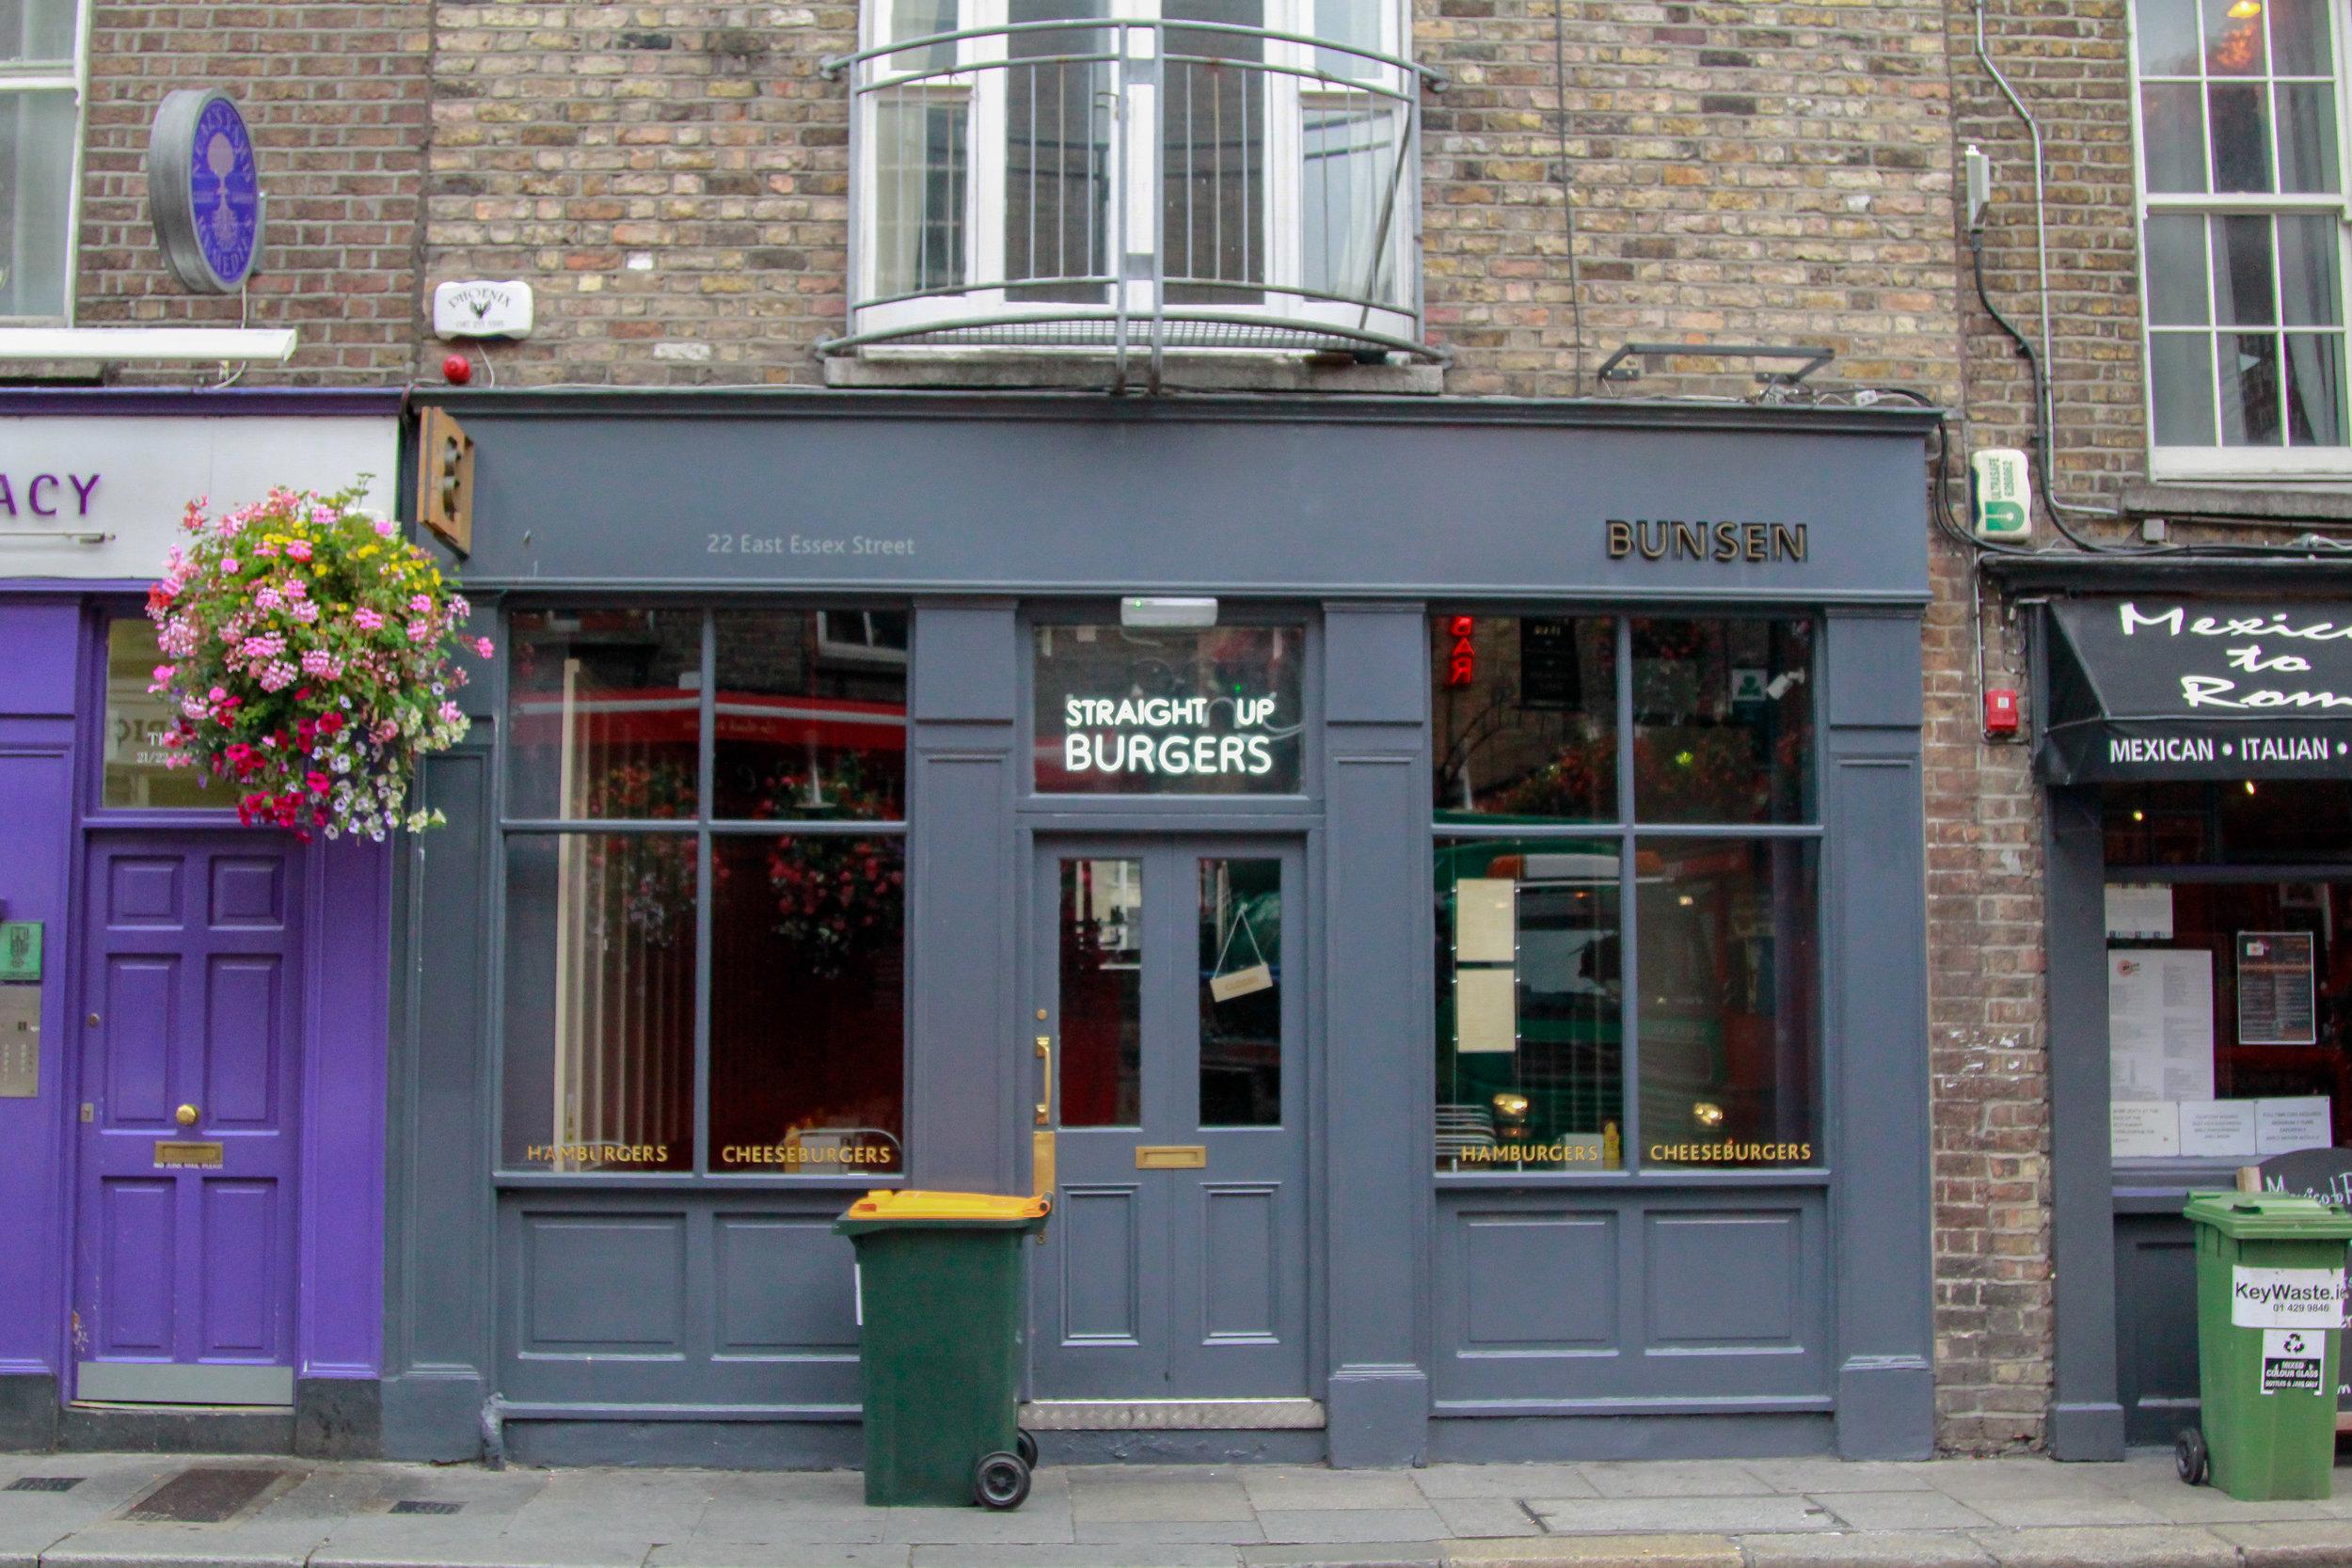 Bunsen - best burger in Dublin